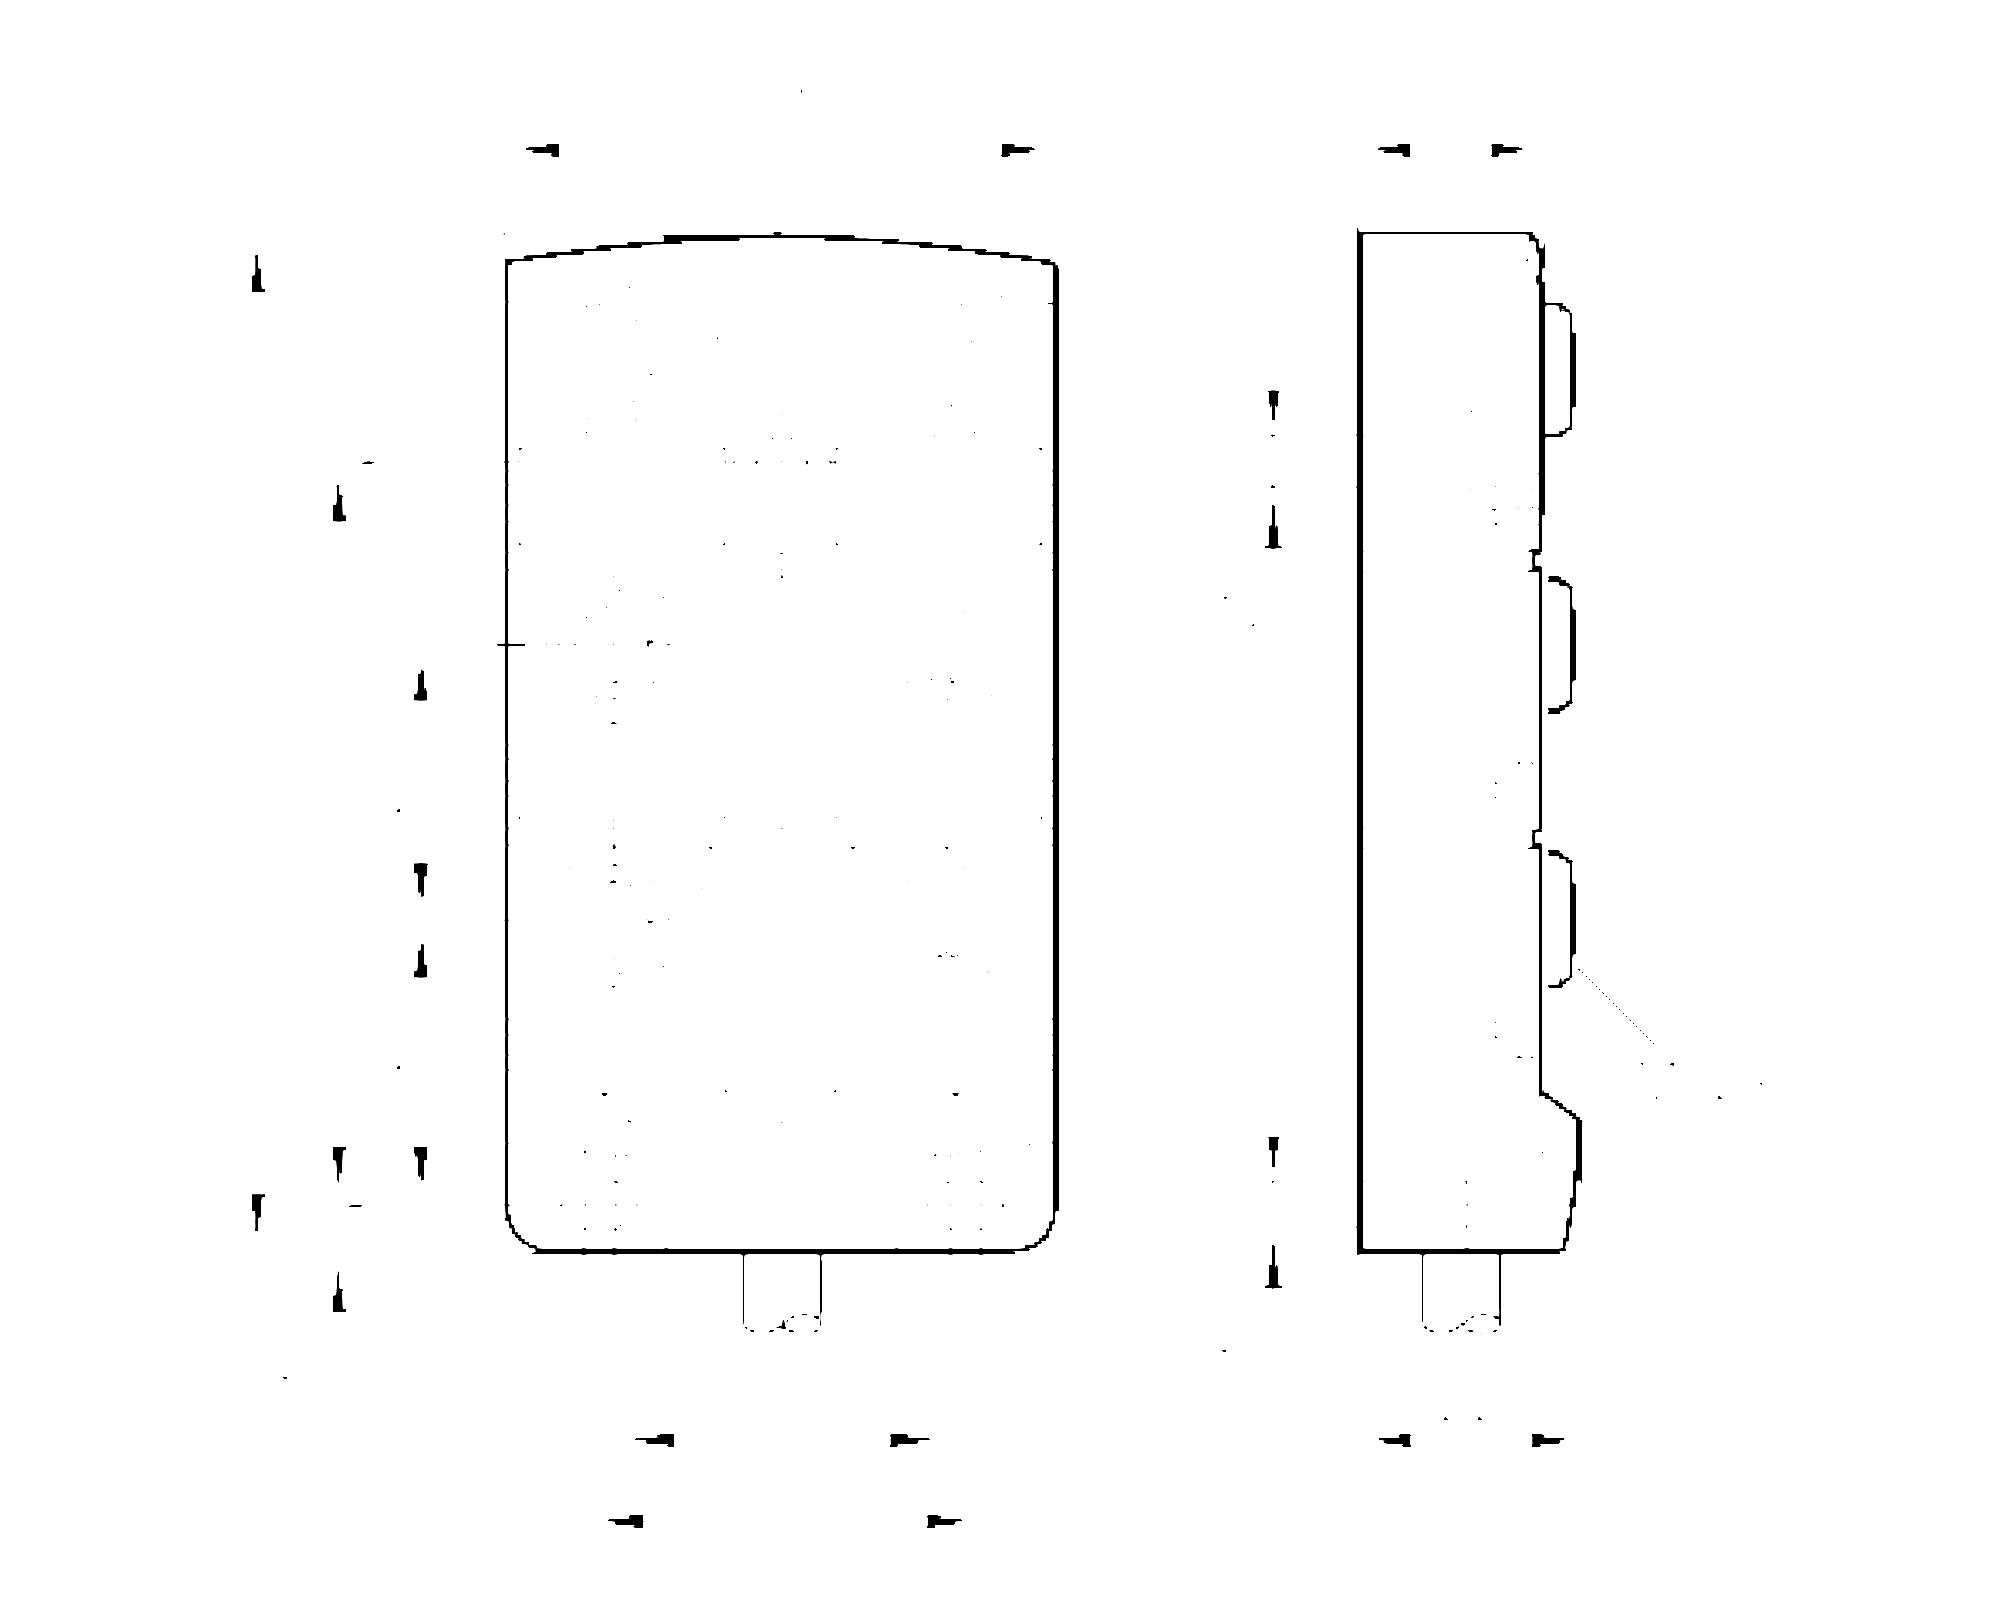 EBC037 - Splitter box - ifm electronic